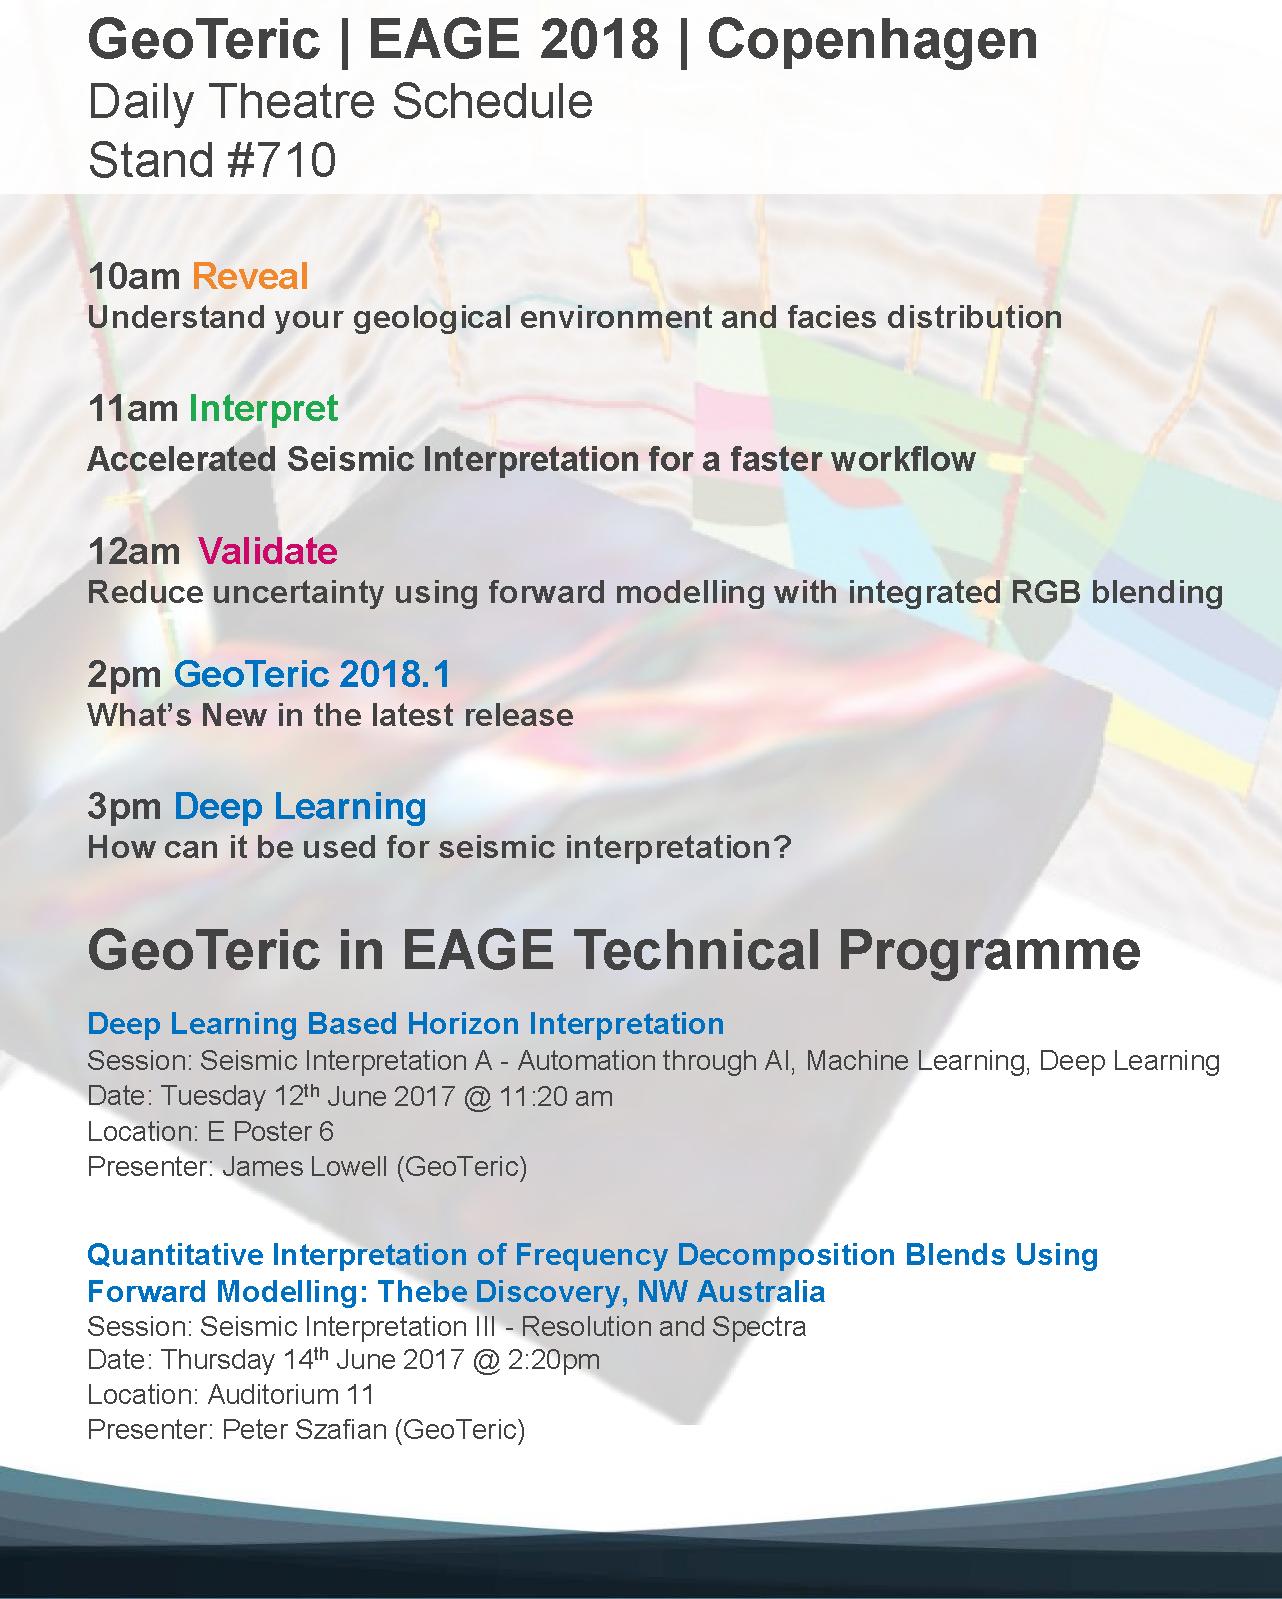 EAGE 2018 Presentation Agenda